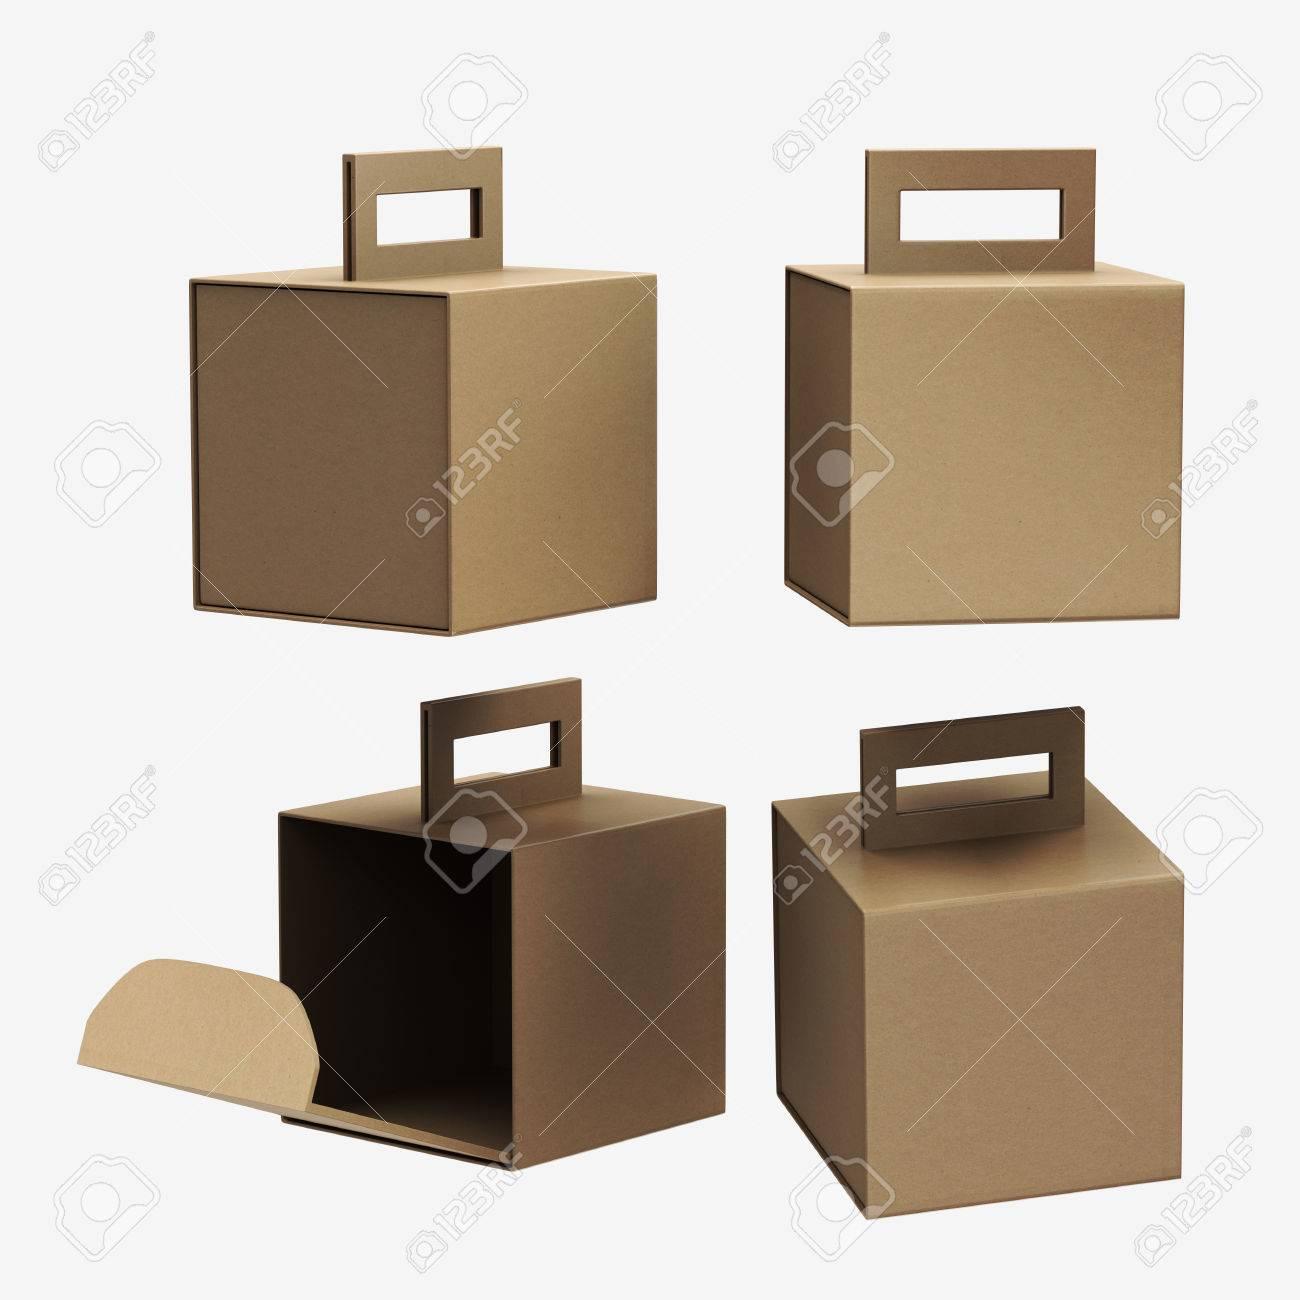 Kraft paper carton box with handle